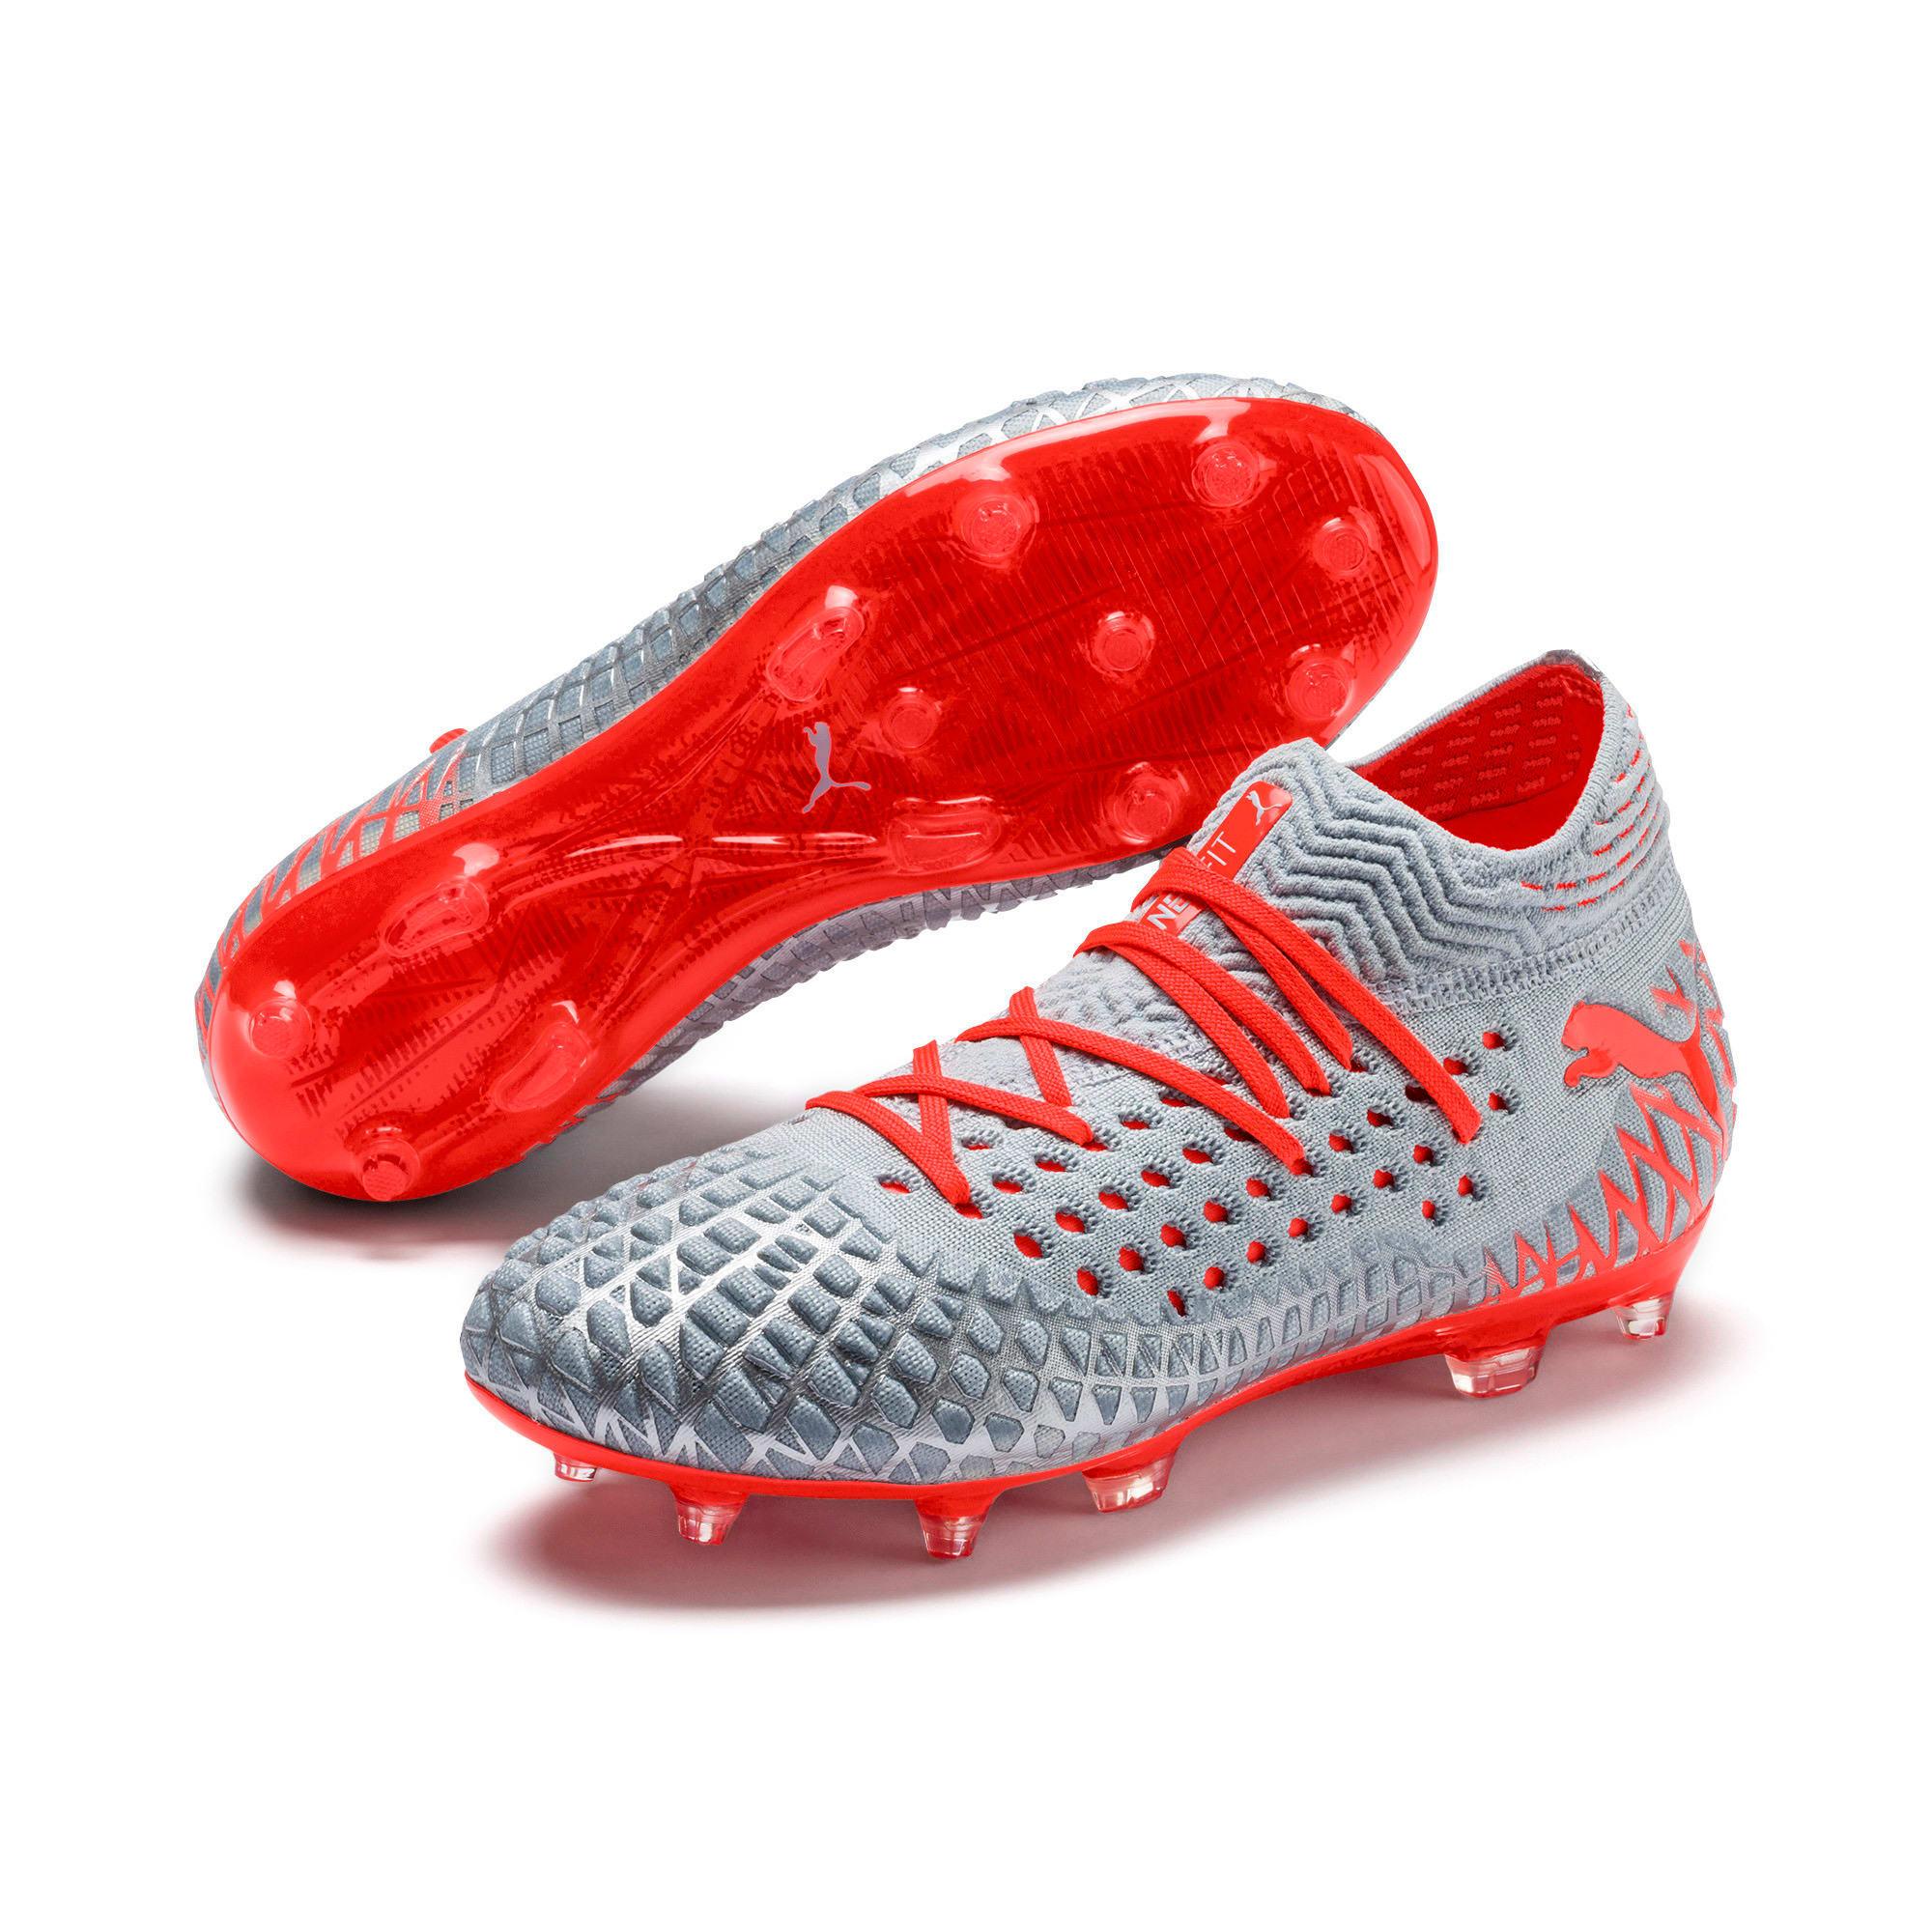 Thumbnail 2 of FUTURE 4.1 NETFIT FG/AG Soccer Cleats JR, Blue-Nrgy Red-High Risk Red, medium